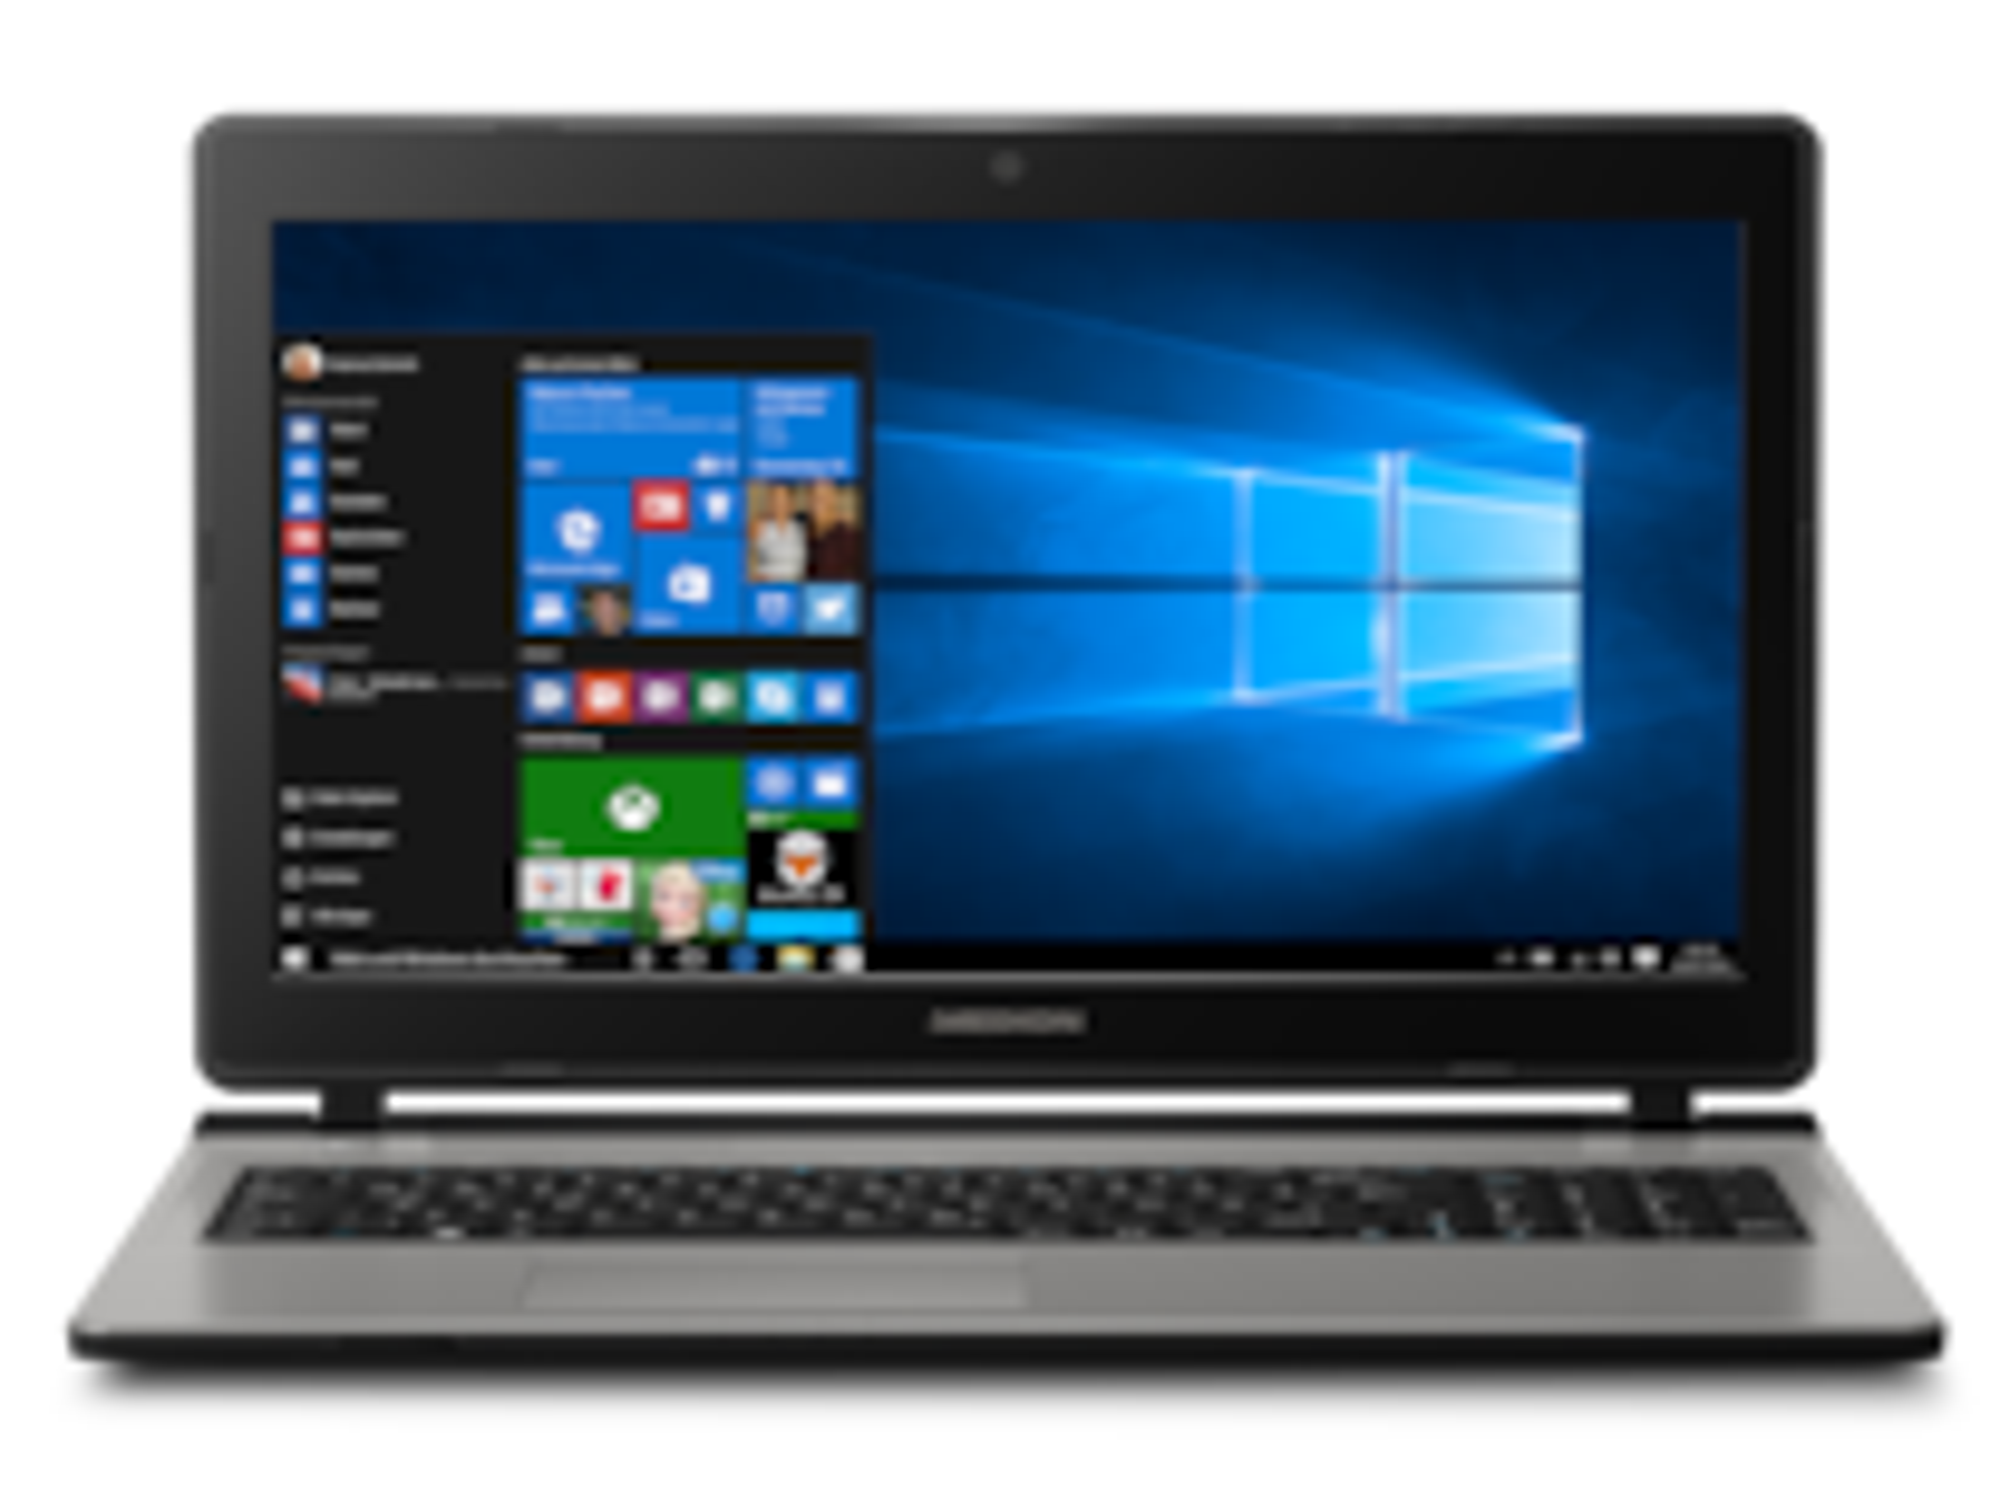 MEDION AKOYA E6436 i3 laptop